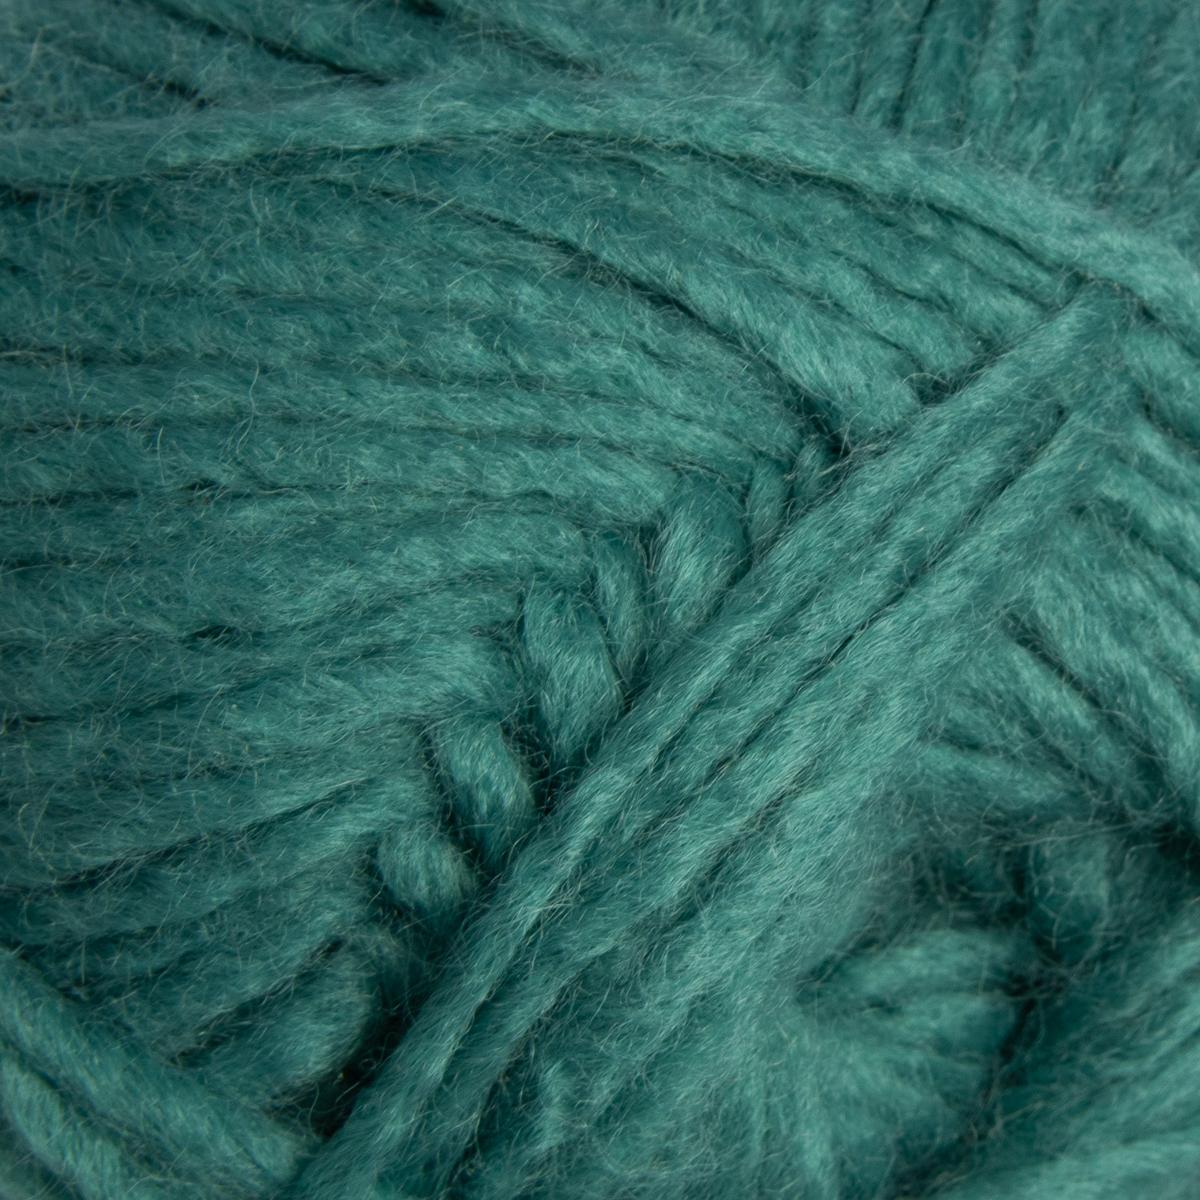 3pk-Lion-Brand-New-Basic-Acrylic-amp-Wool-Yarn-Medium-4-Knit-Crochet-Skeins-Soft thumbnail 59